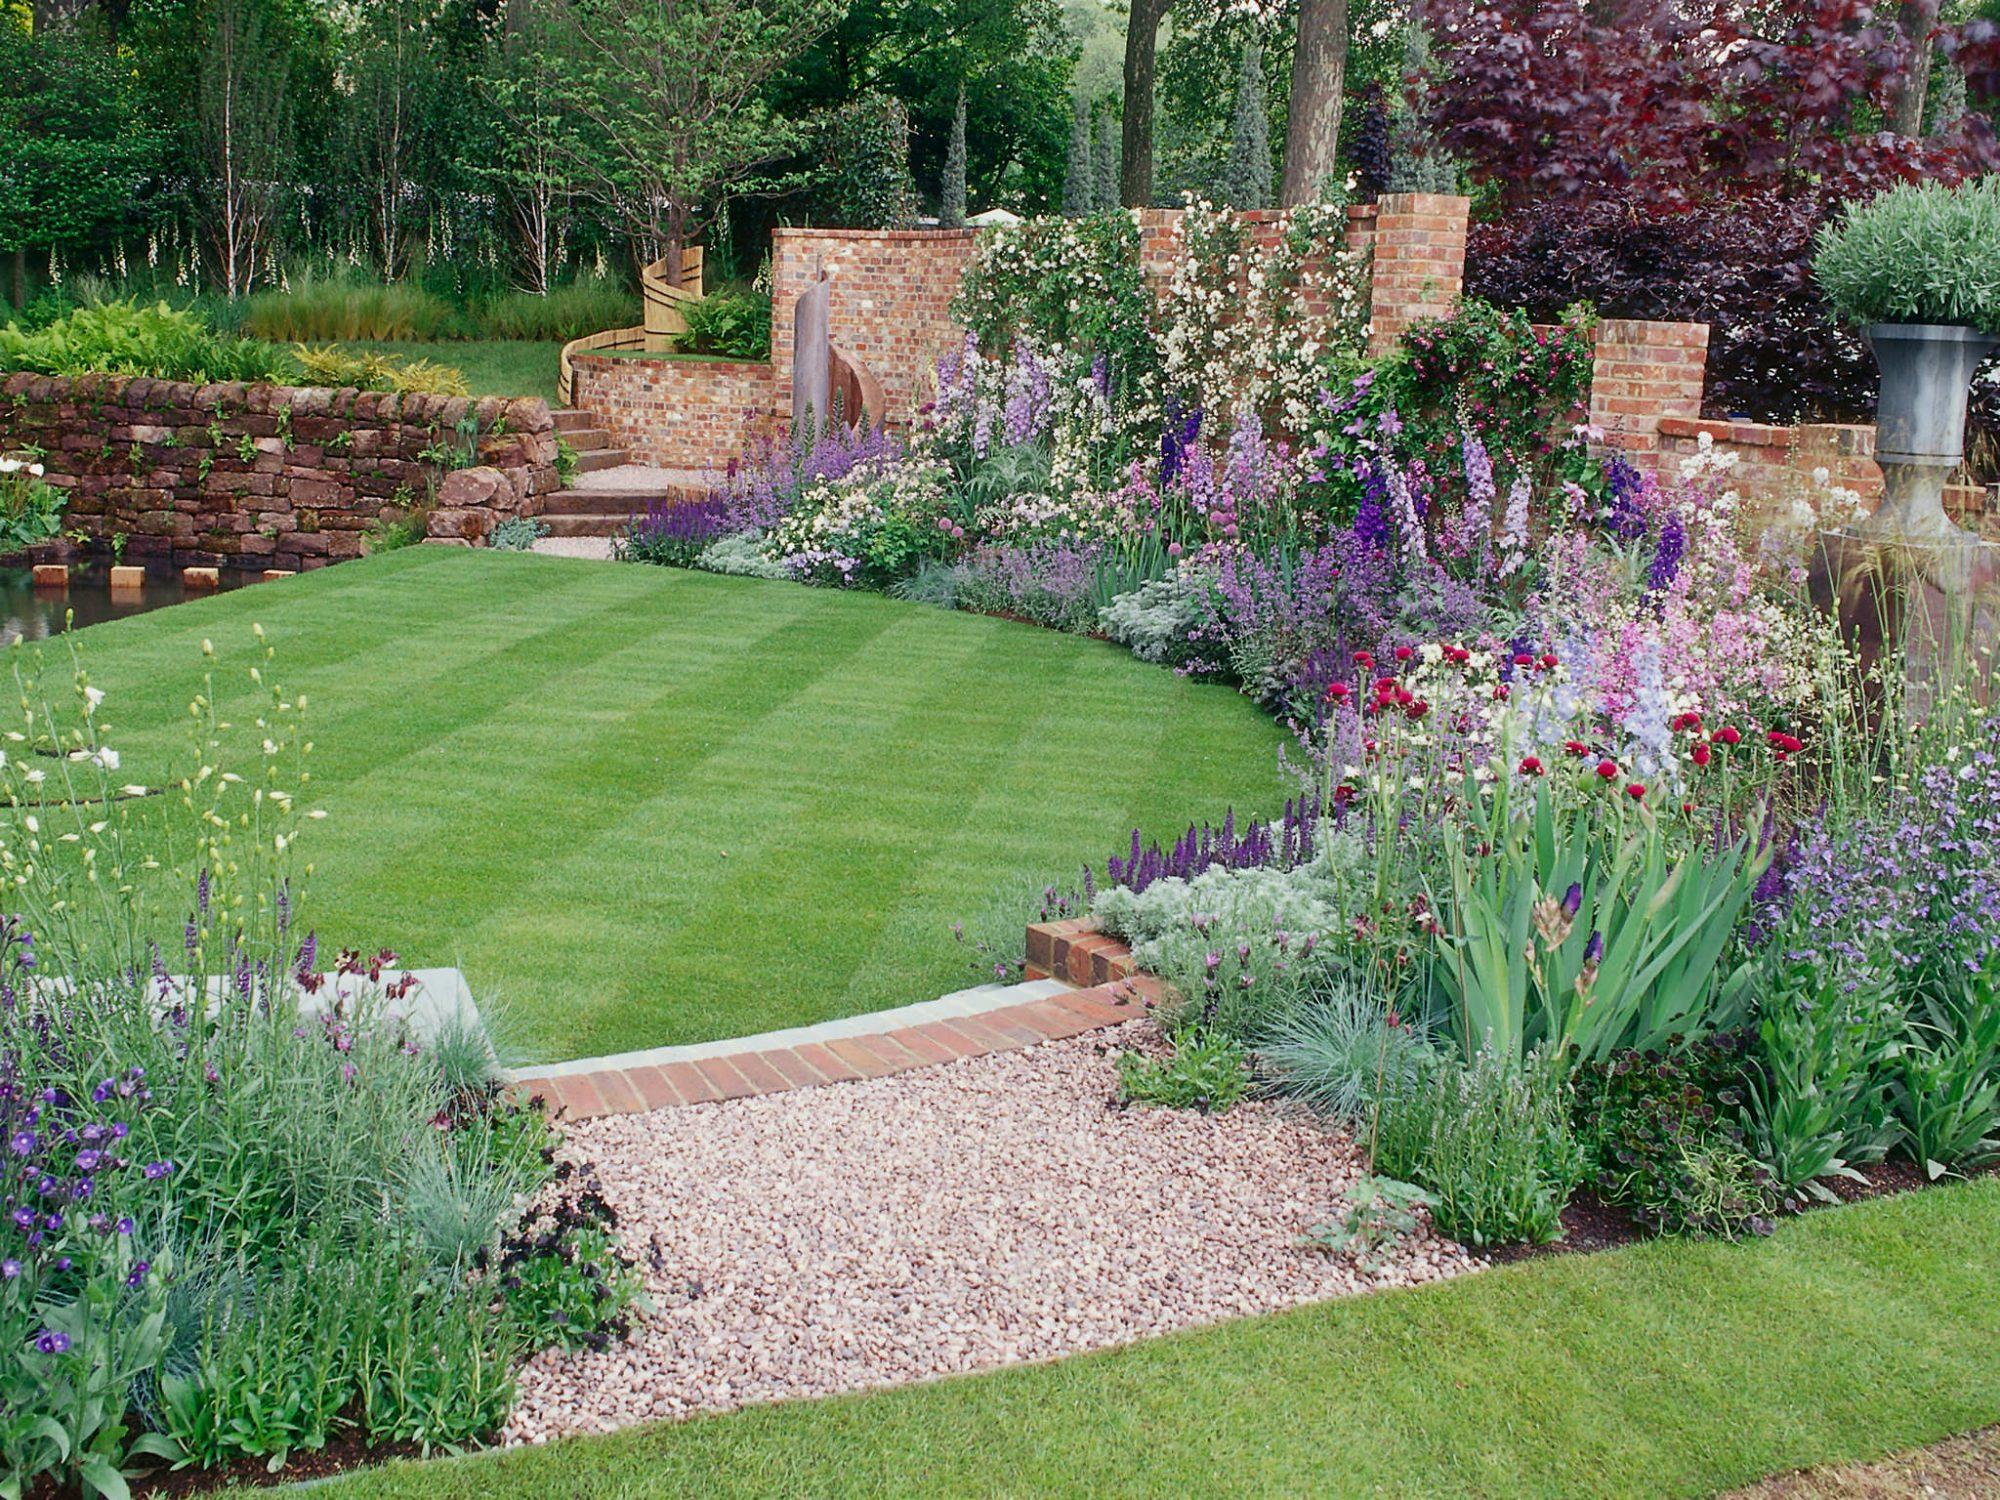 25 Simple Backyard Landscaping Ideas